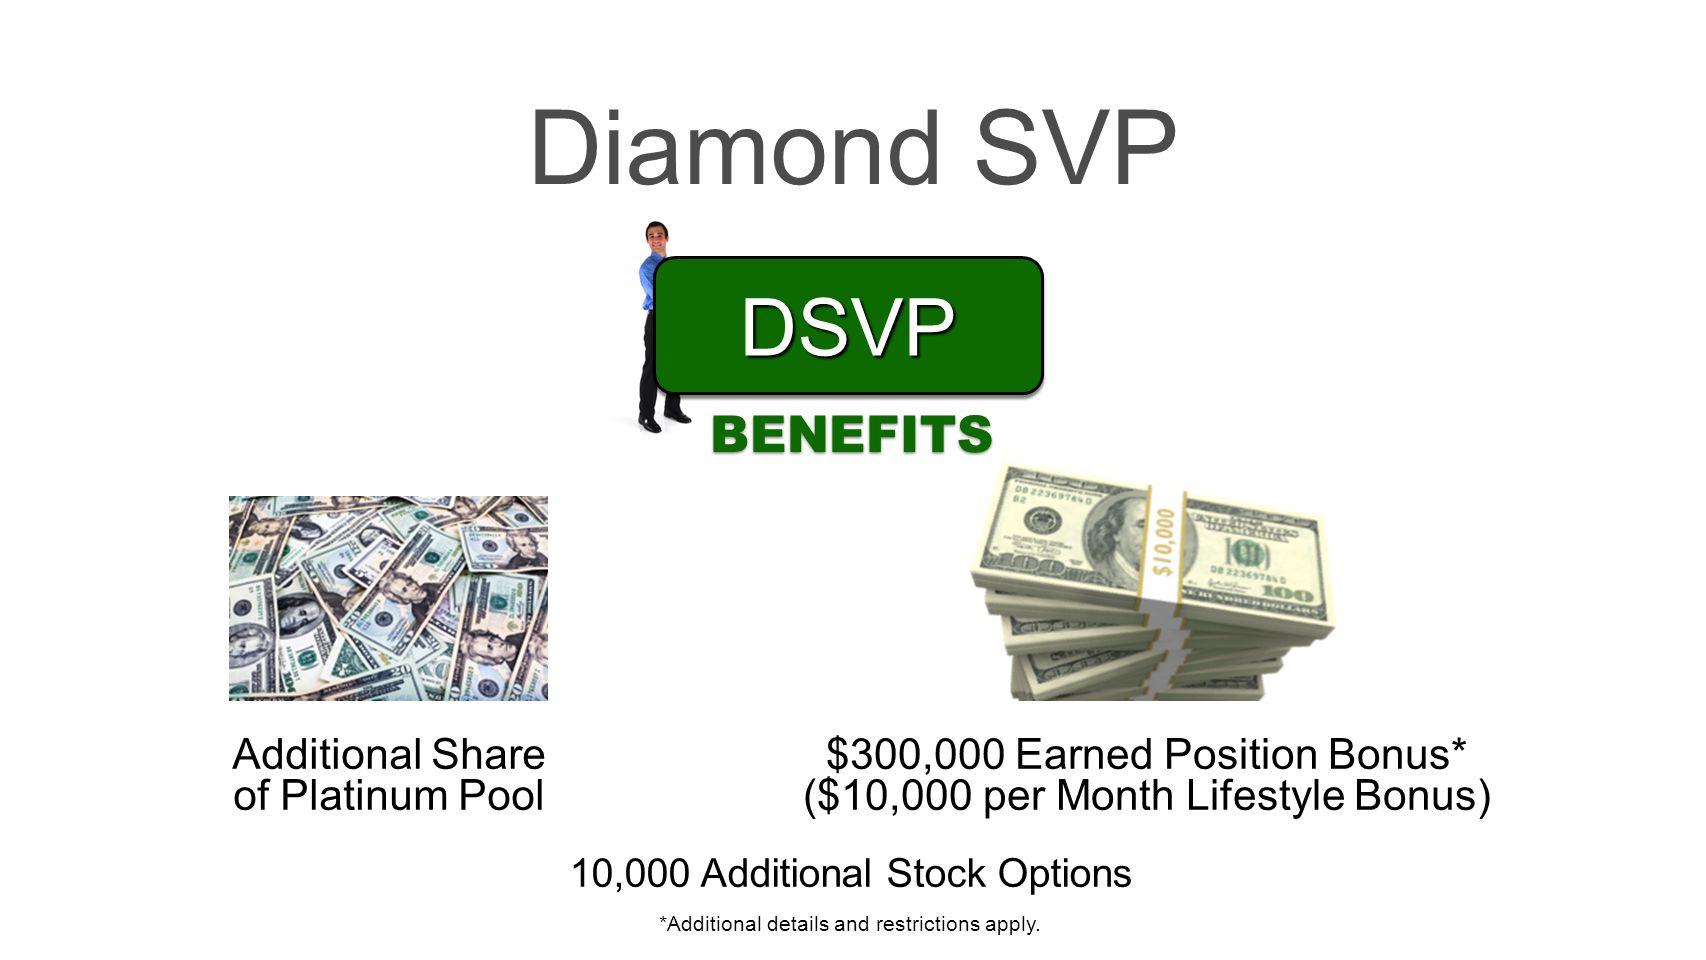 Diamond SVP DSVP BENEFITS Additional Share of Platinum Pool